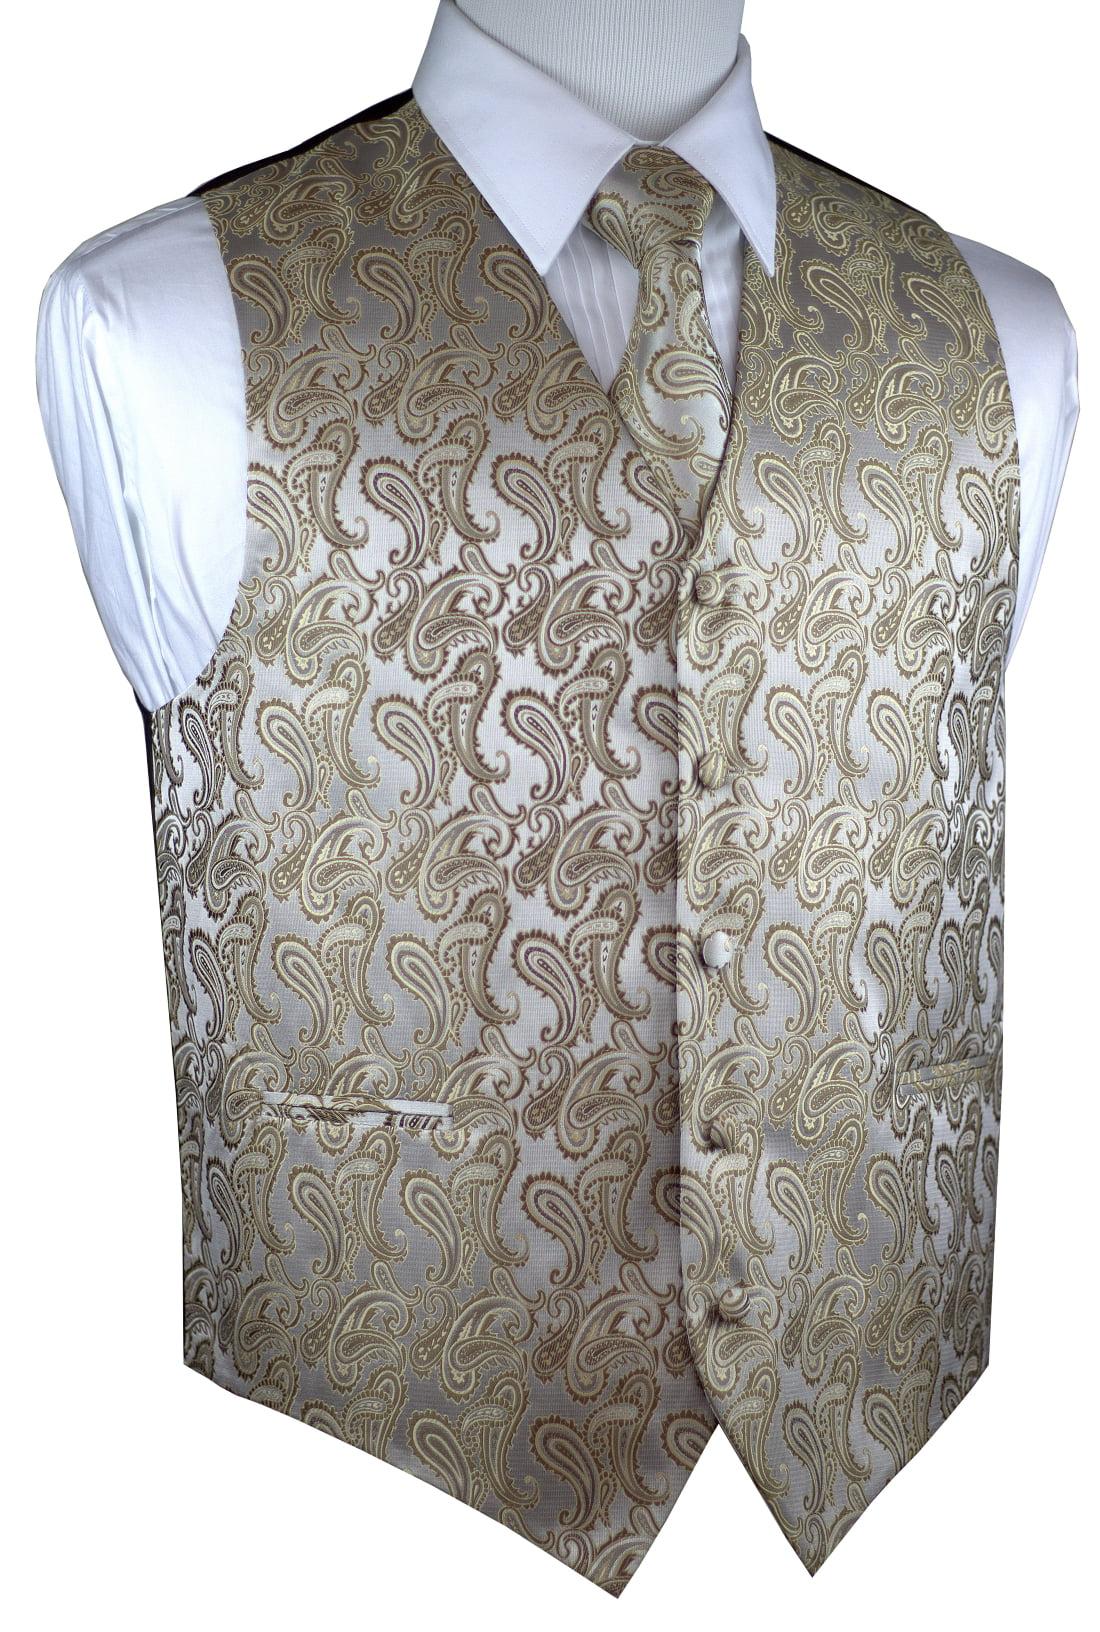 Italian Design, Men's Tuxedo Vest, Tie & Hankie Set - Dark Champagne Paisley